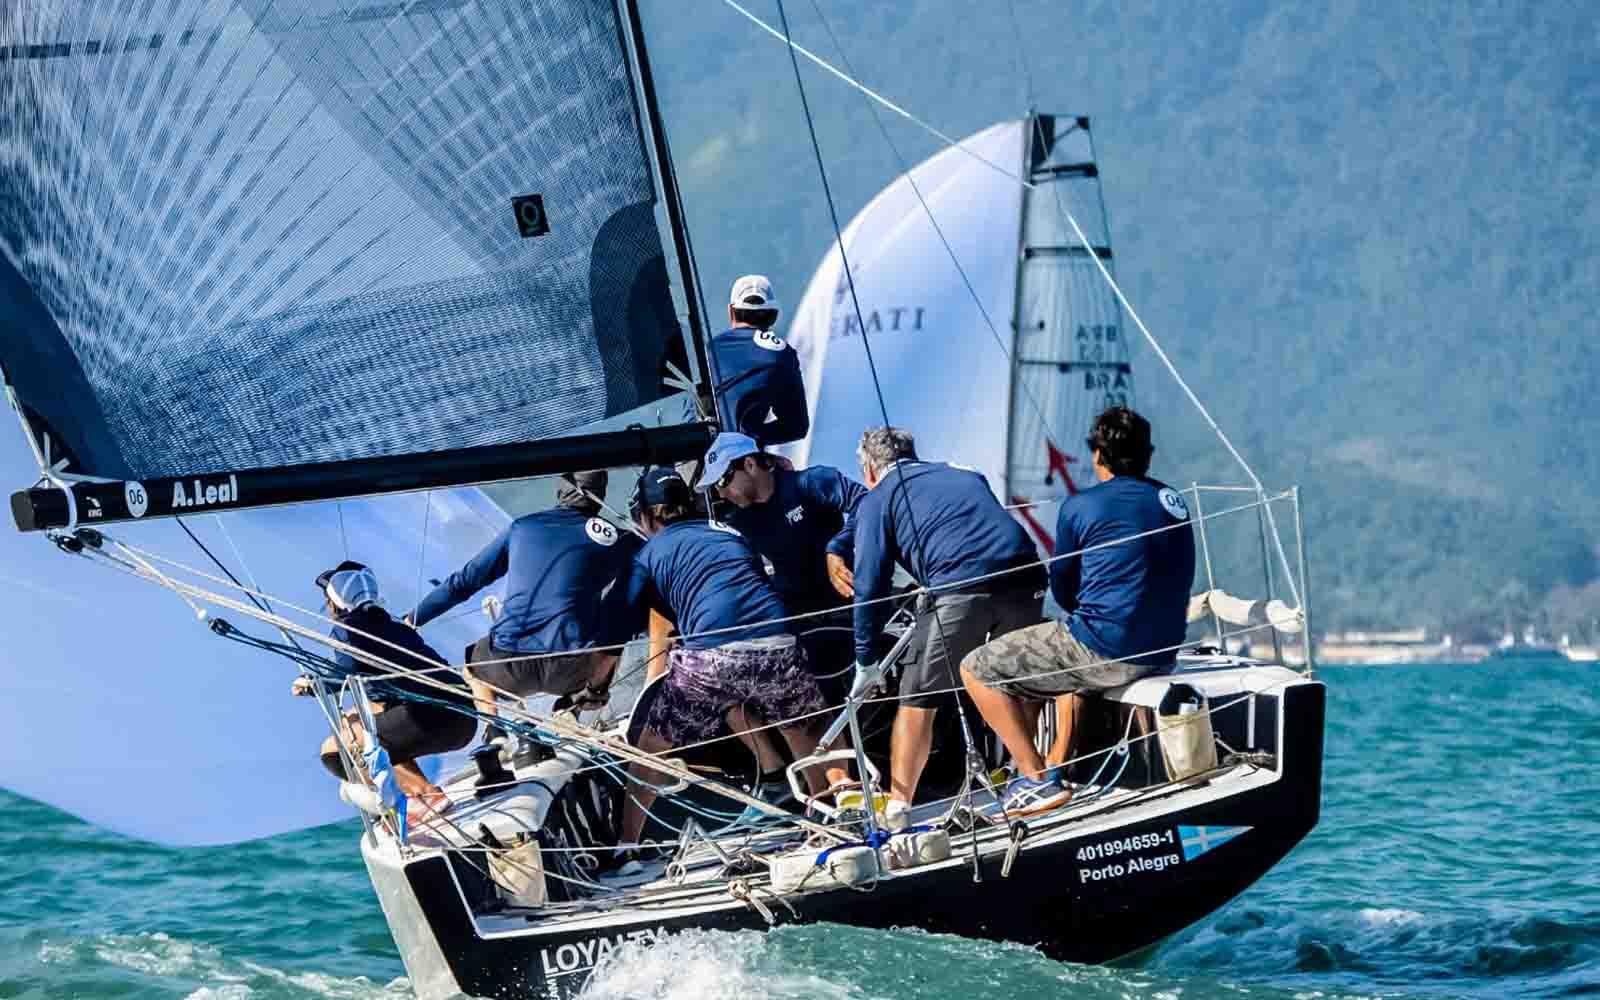 Loyalty (Aline Bassi Balaio de Ideias) - boat shopping